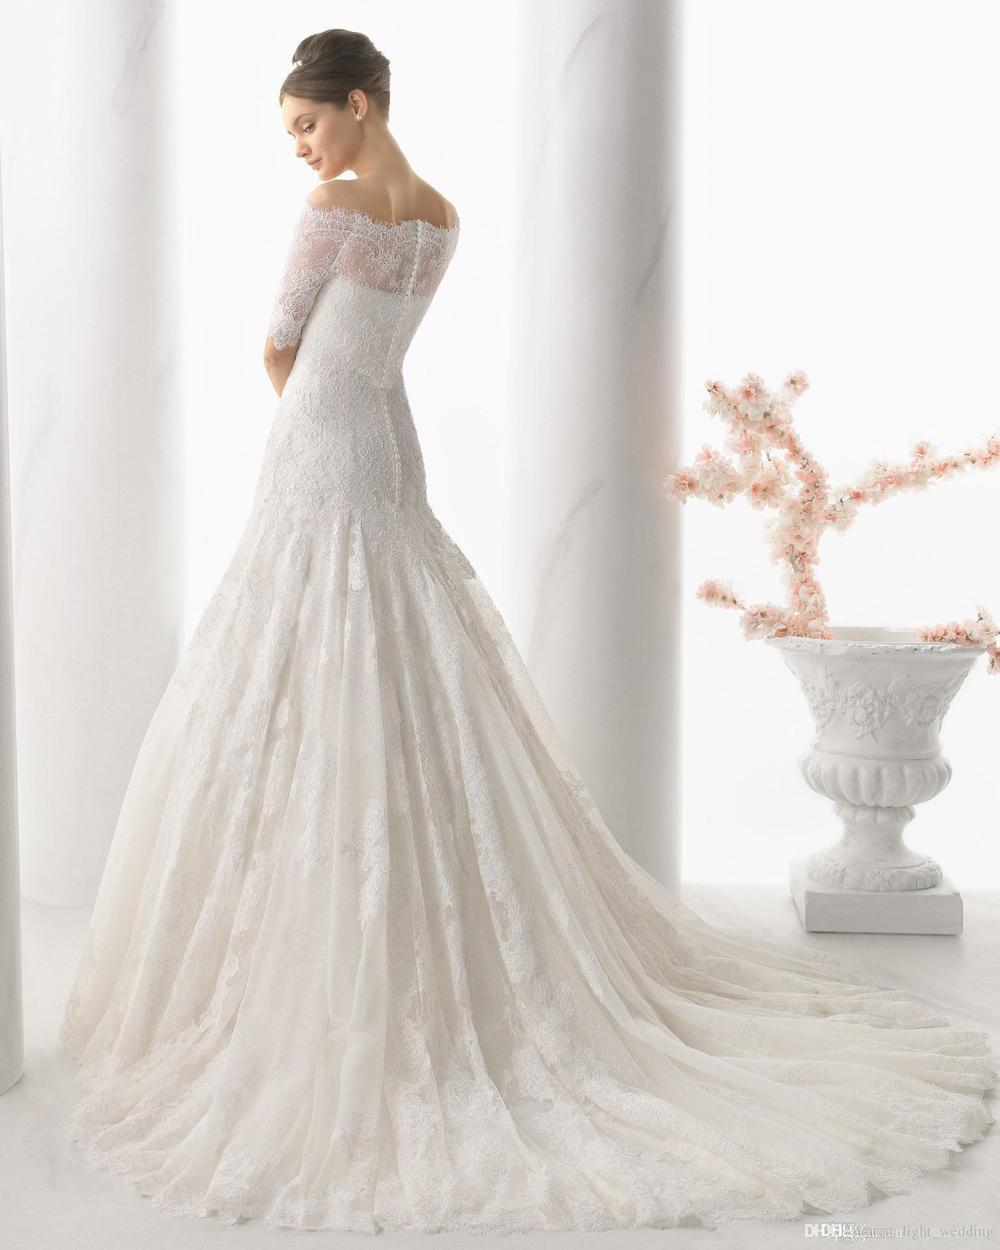 Exemple de robe de mariée